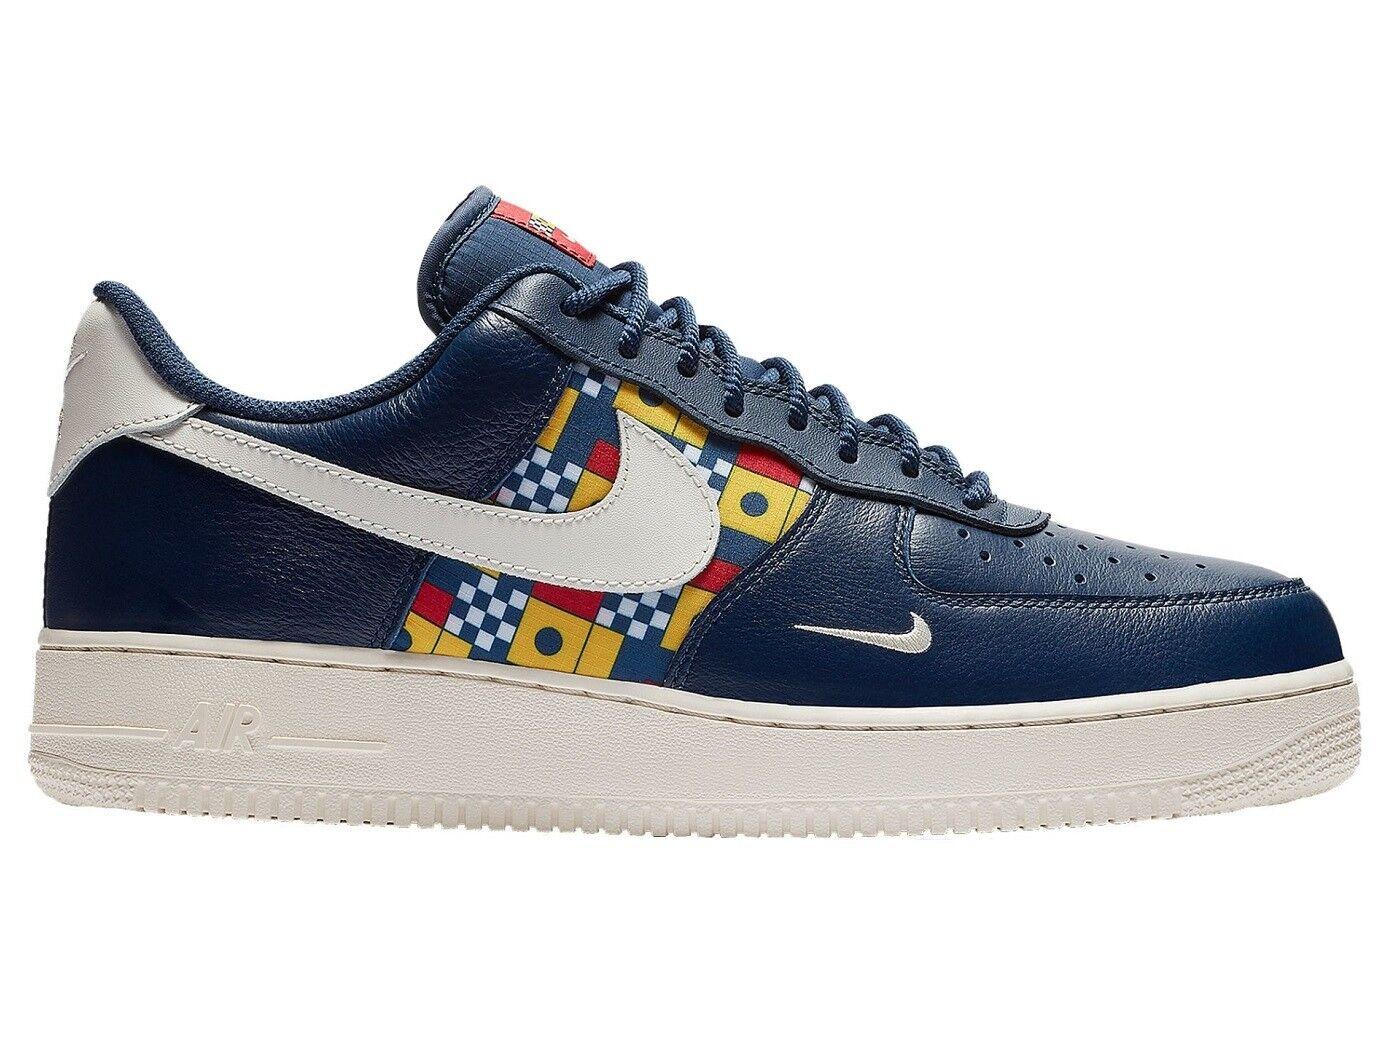 Nike Air Force 1 LV8 Nautical Redux Mens AR5394-400 Navy Sail Shoes Comfortable Seasonal price cuts, discount benefits